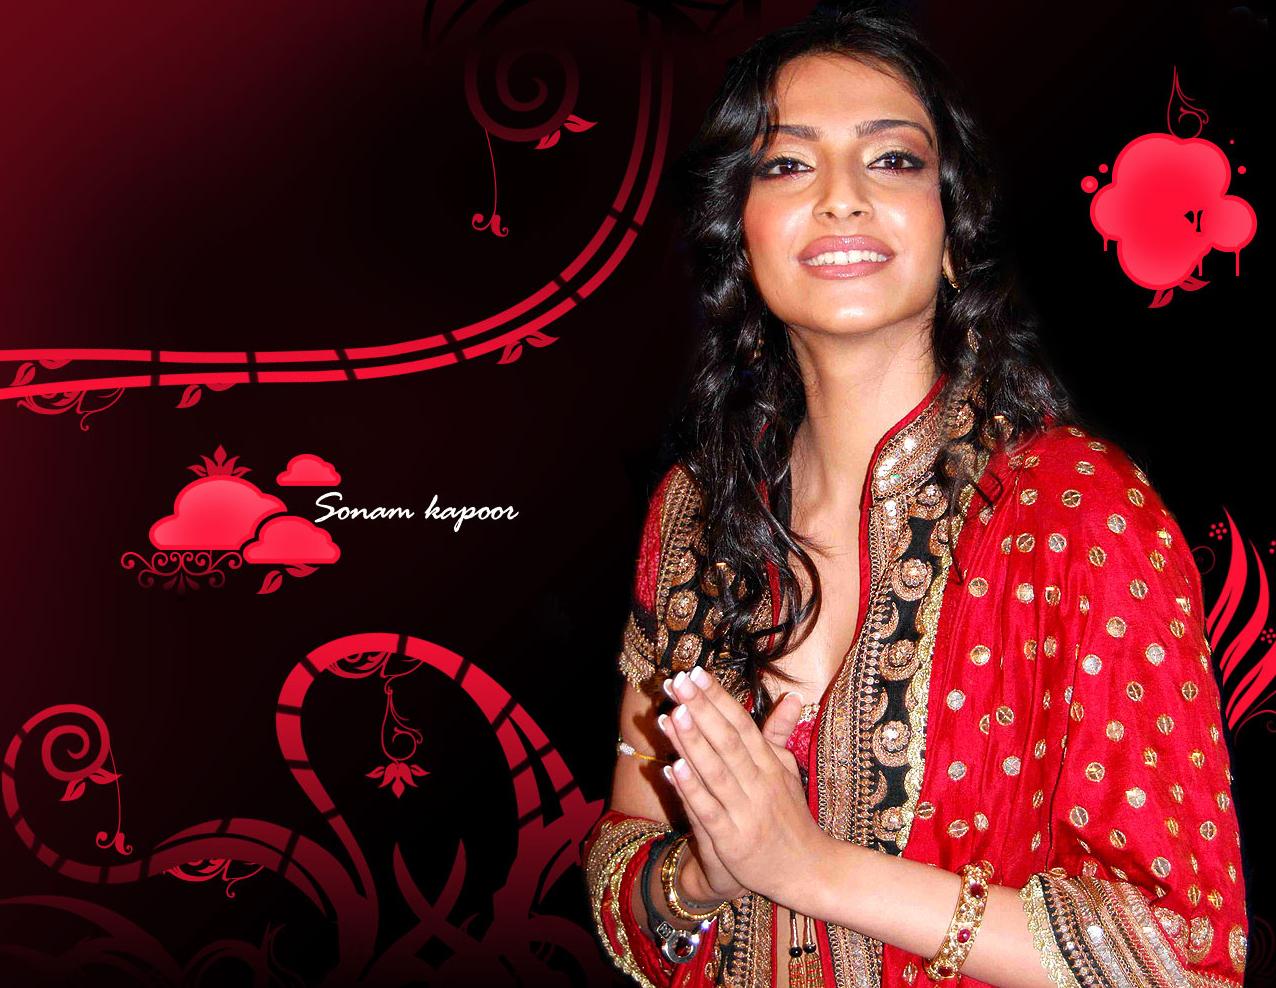 Hot Sonam Kapoor Sexy Cute Pics - Sabwoodcom-9412